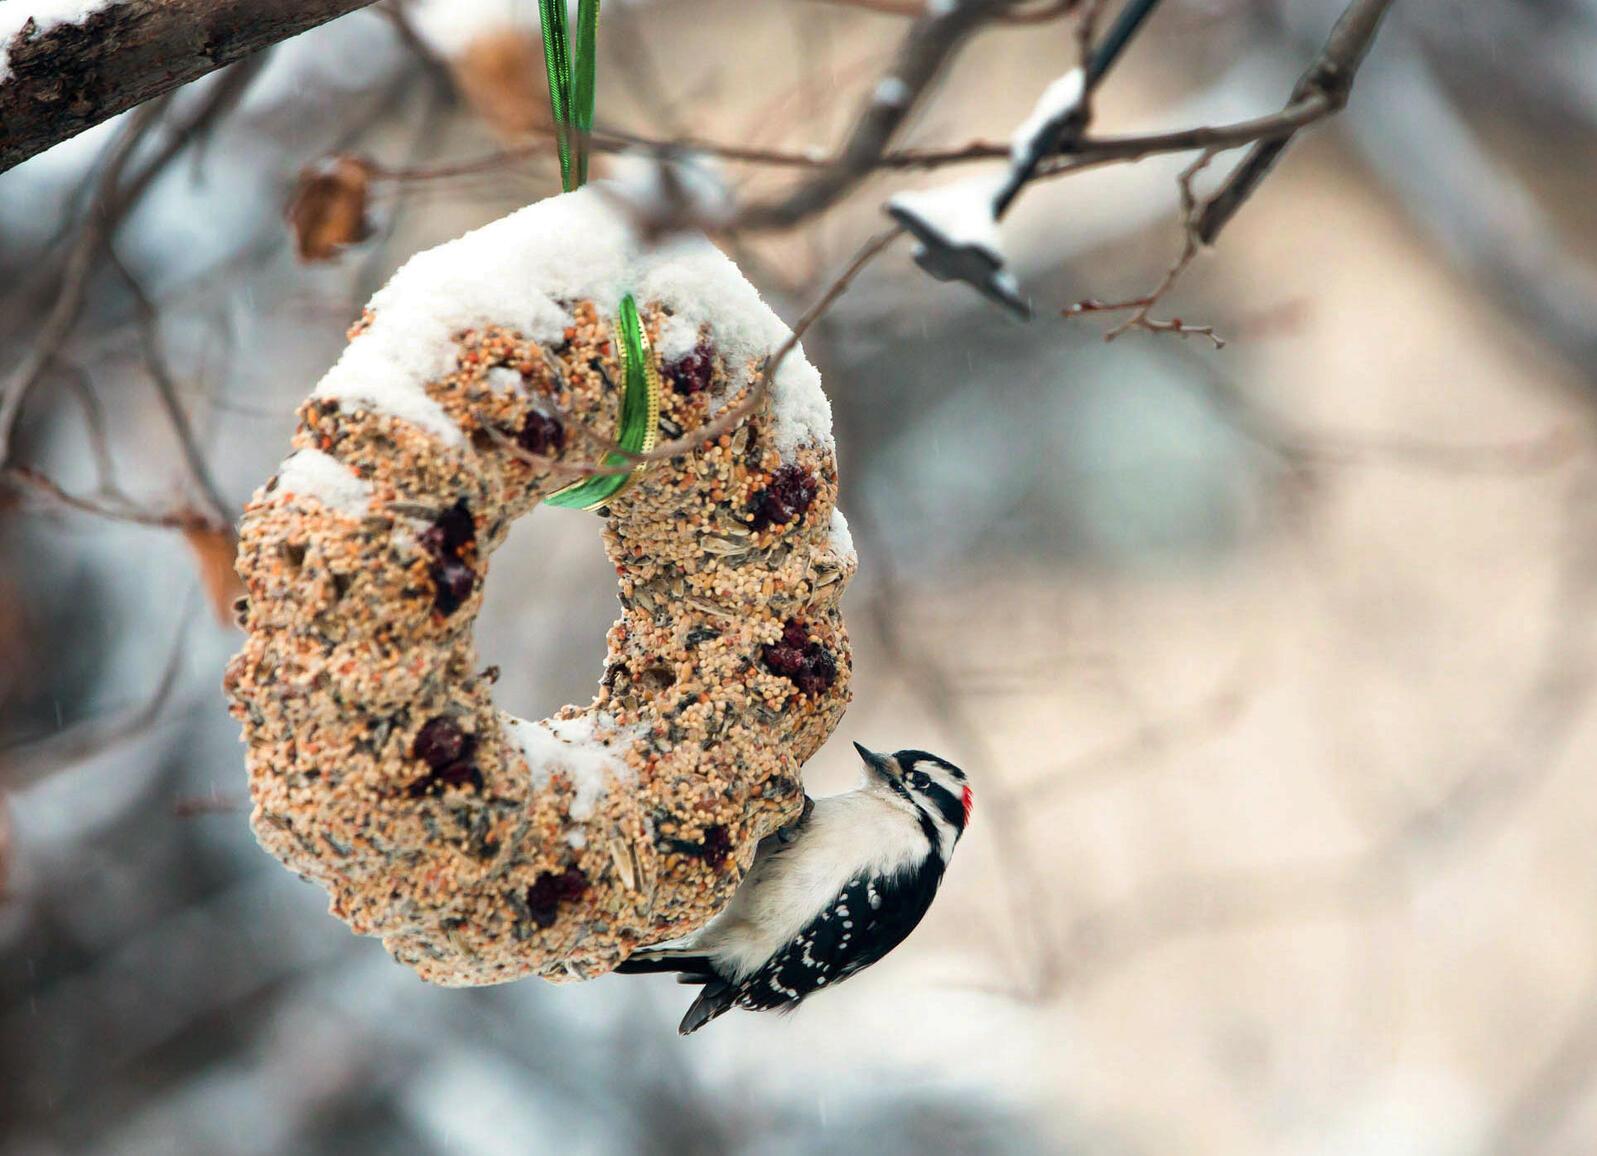 Downy Woodpecker. Evilrobotsmash/Flickr (CC BY-NC-SA 2.0)